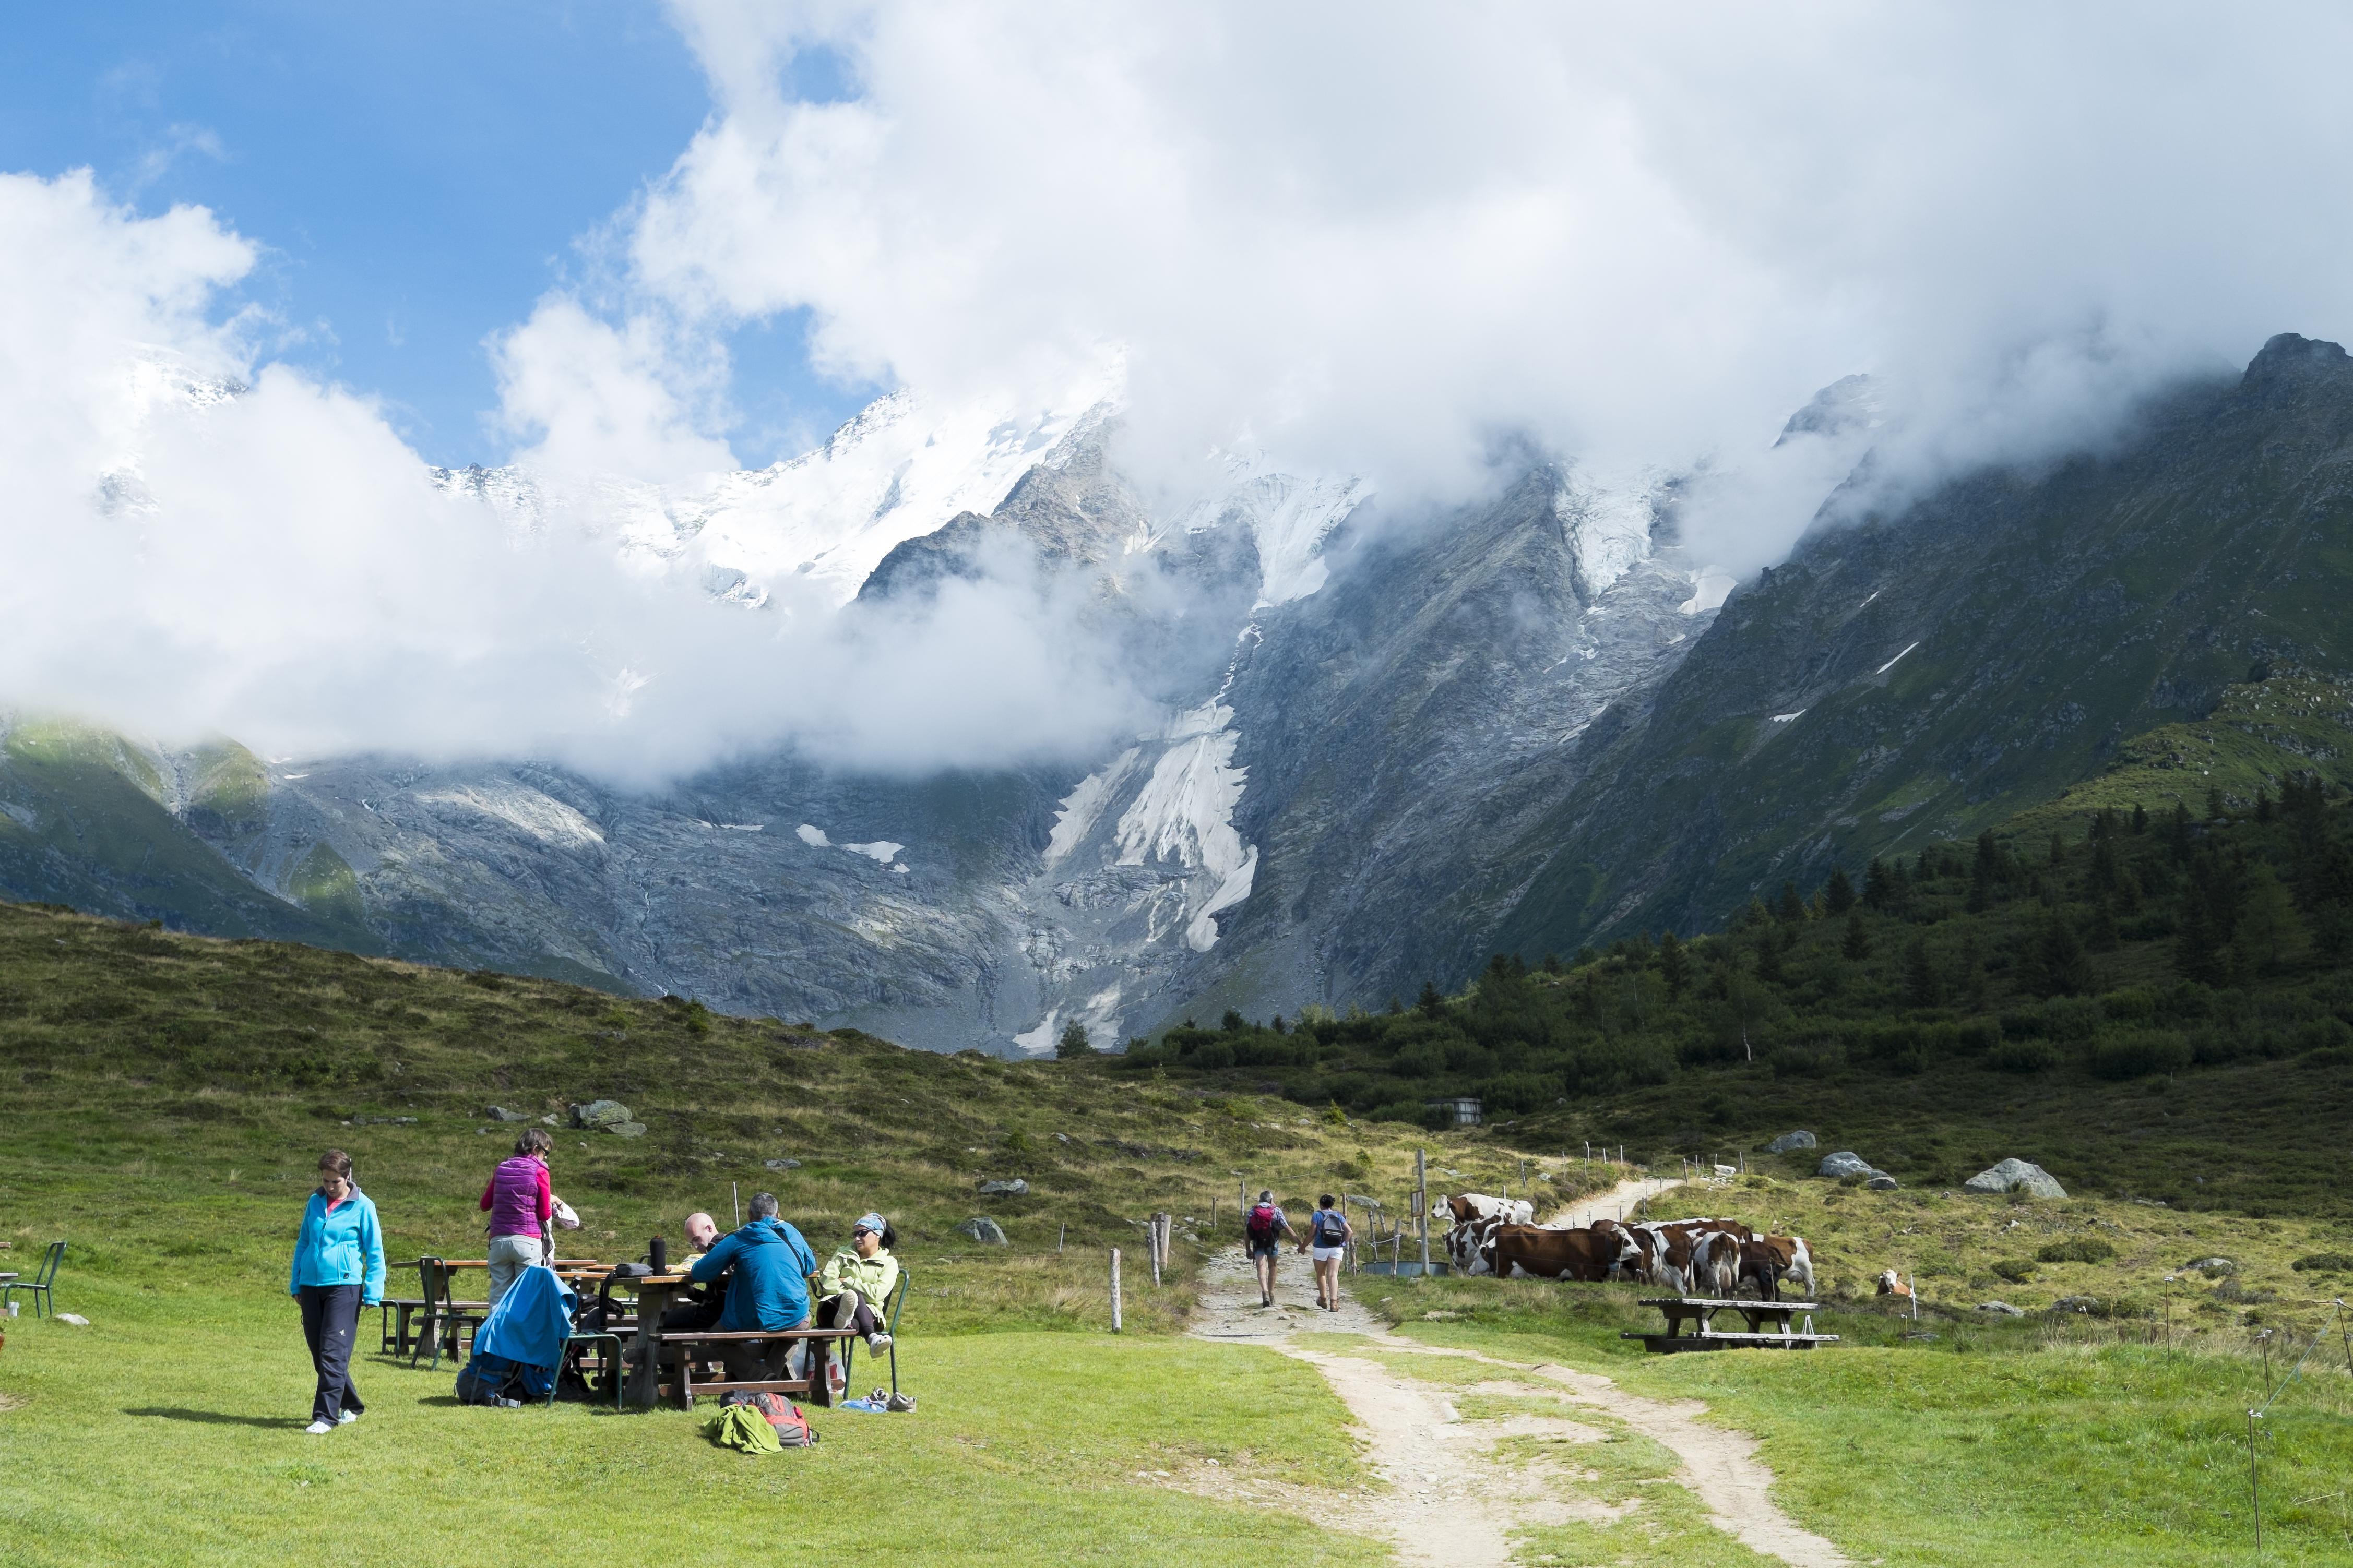 Mont Blanc tour hikers enjoy a break in beautiful surroundings